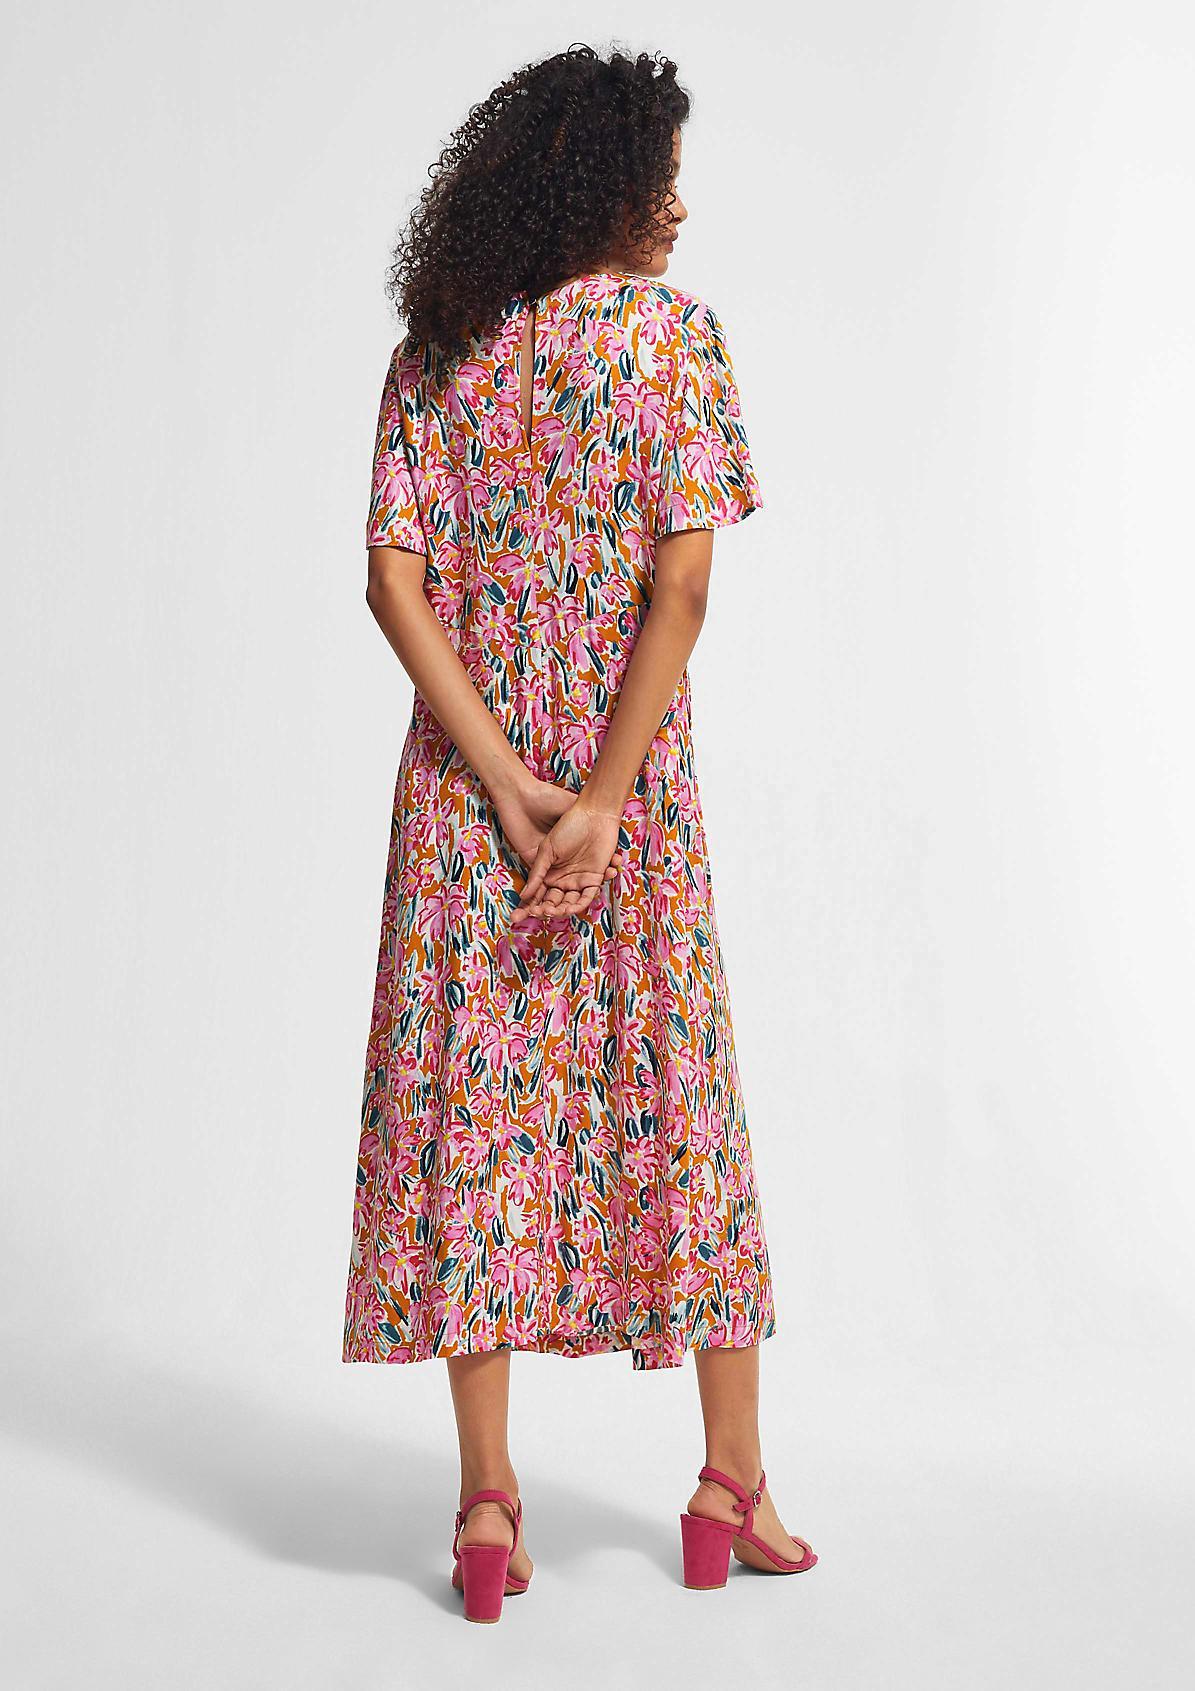 Florales Kleid mit Tunnelzug